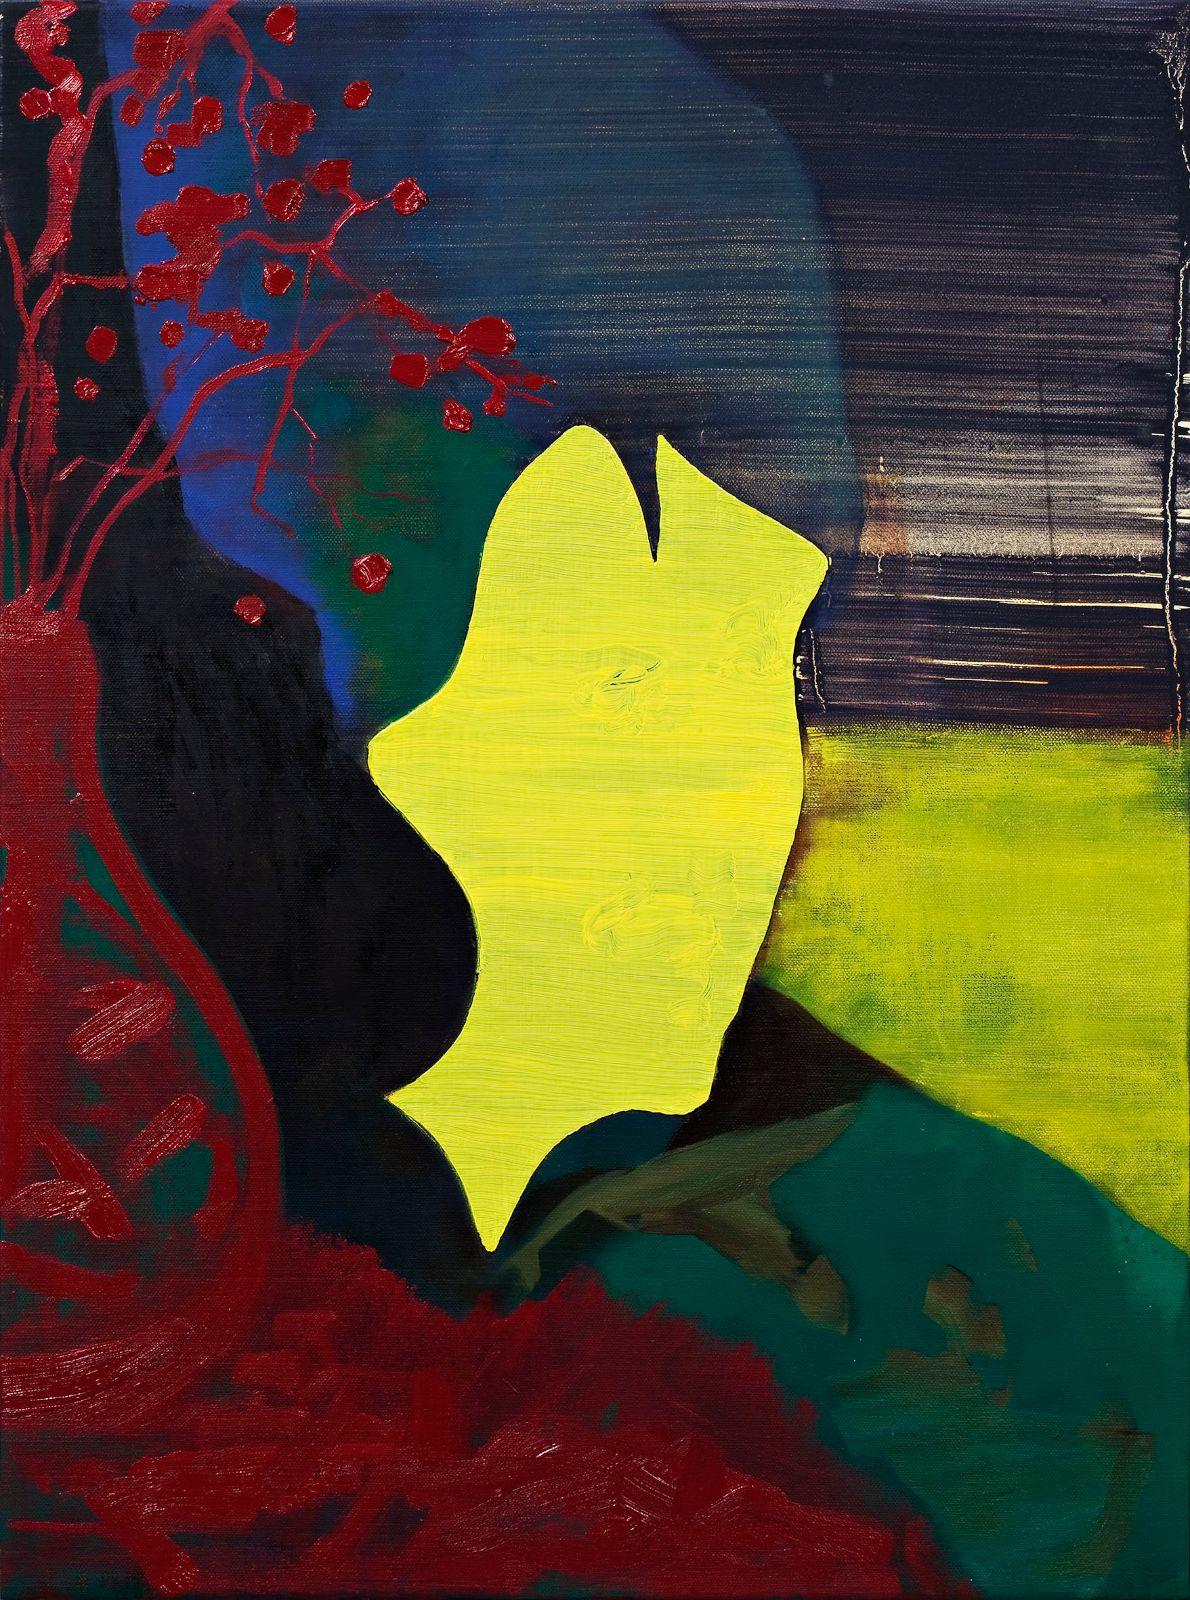 La Japonaise, 2009, oil and acrylic on canvas on panel, 60 x 45 cm